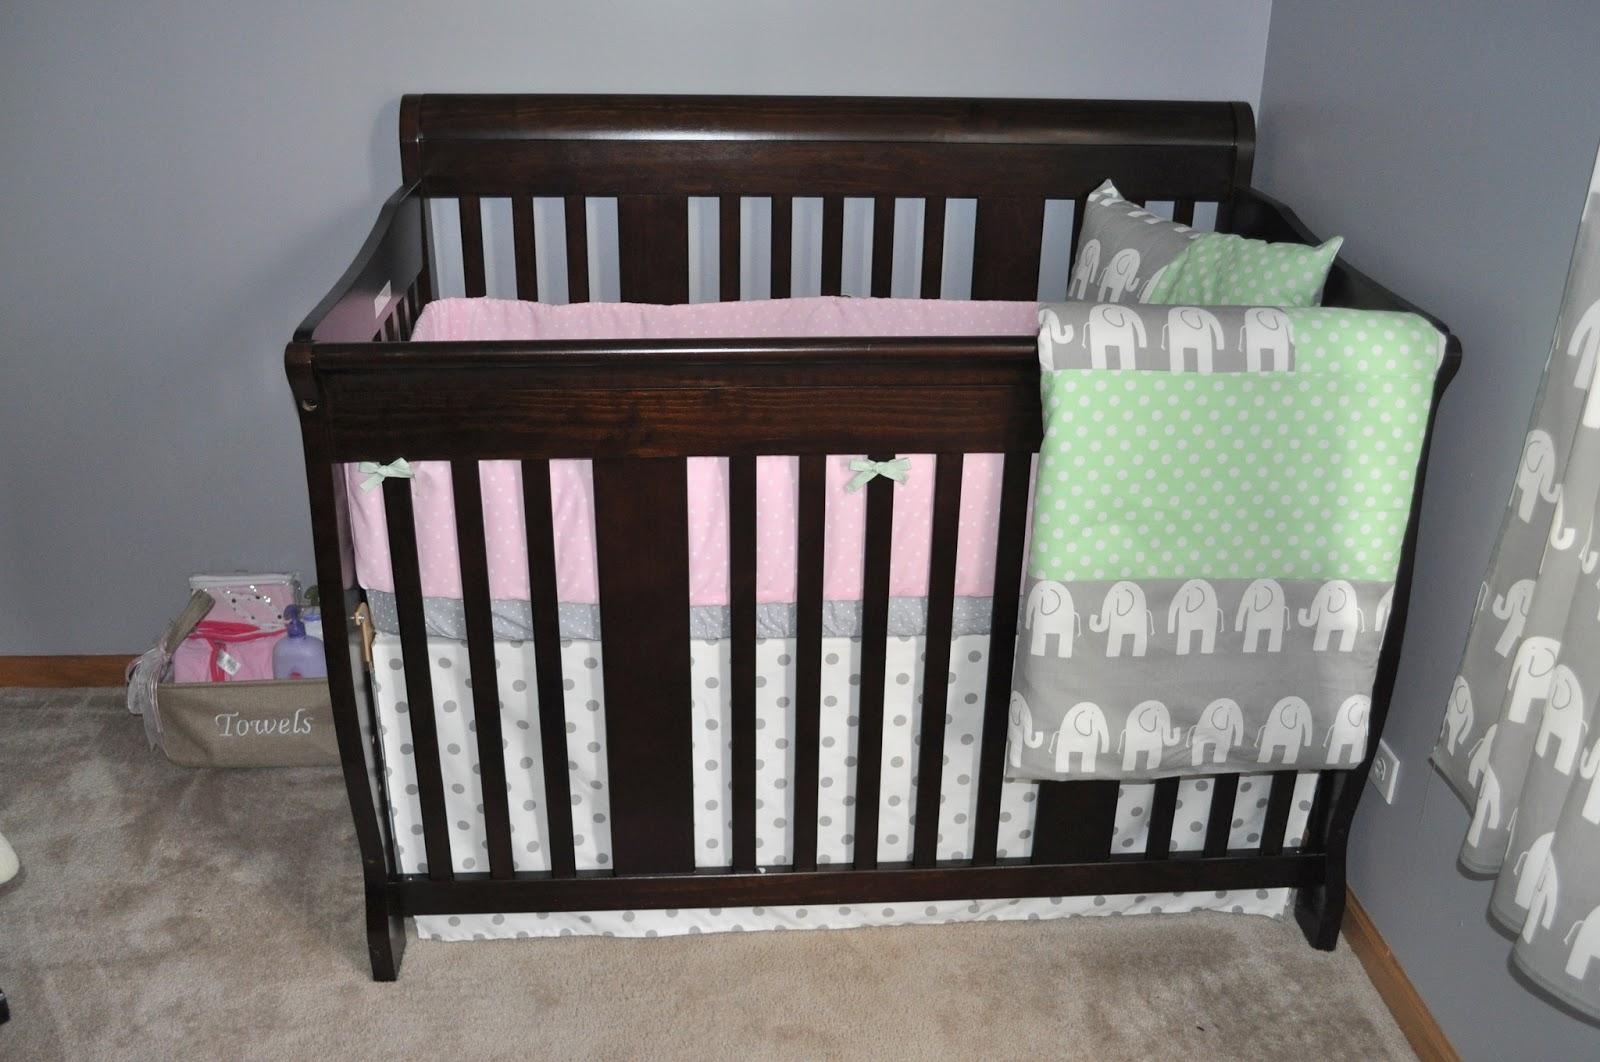 Baby cribs amazon - My Love For Amazon